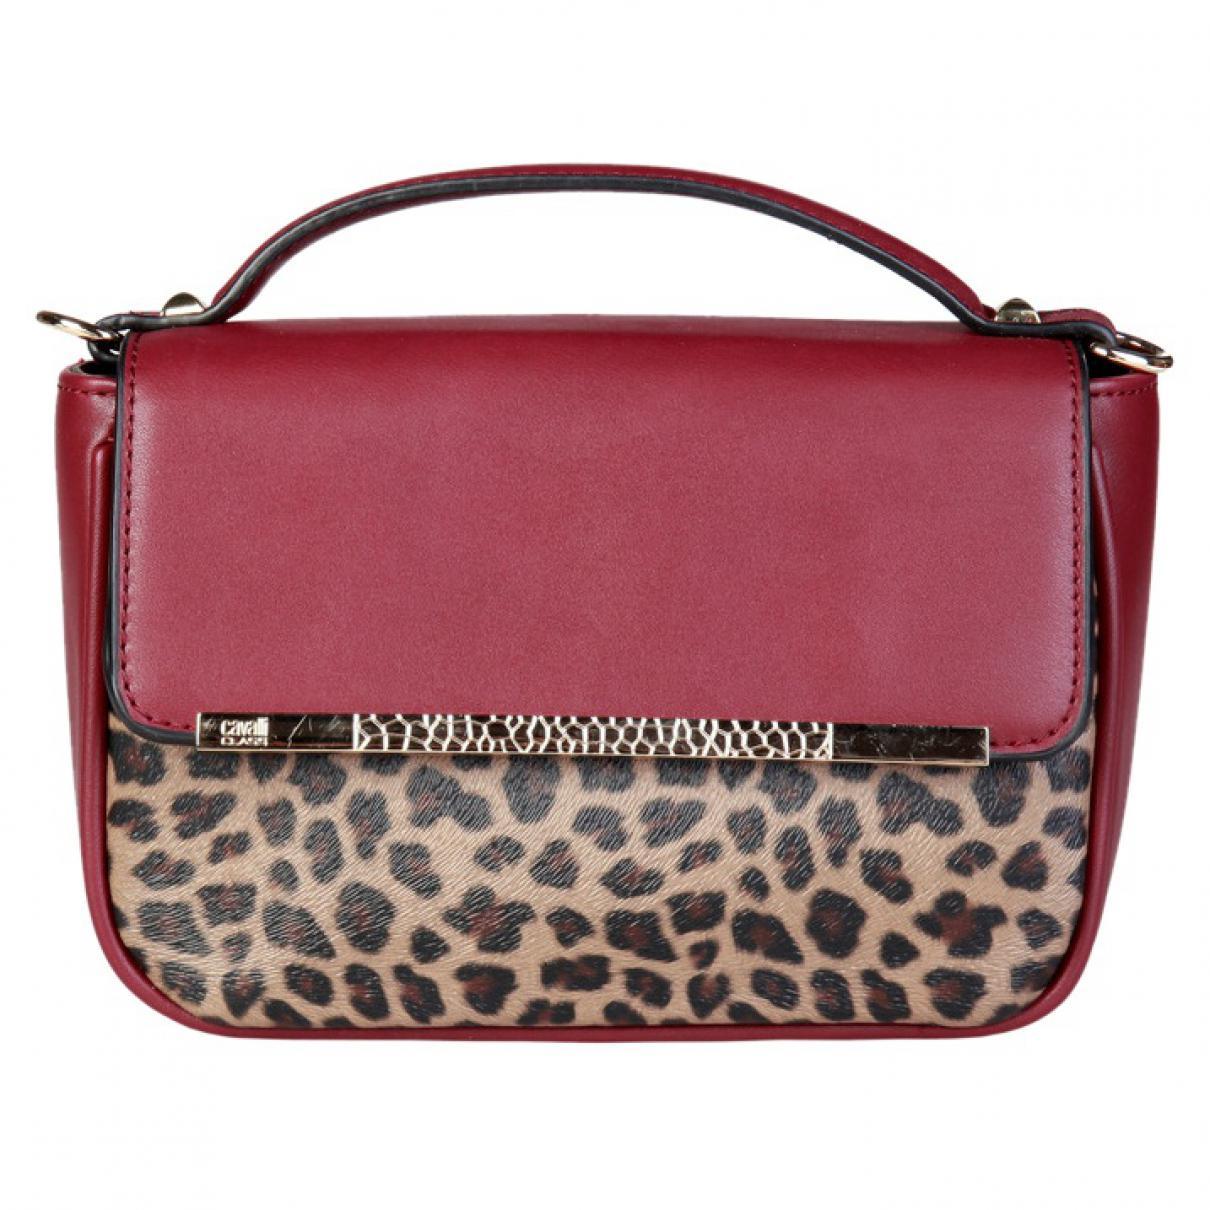 Pre-owned - HAND BAG Just Cavalli IfrN41u6OX